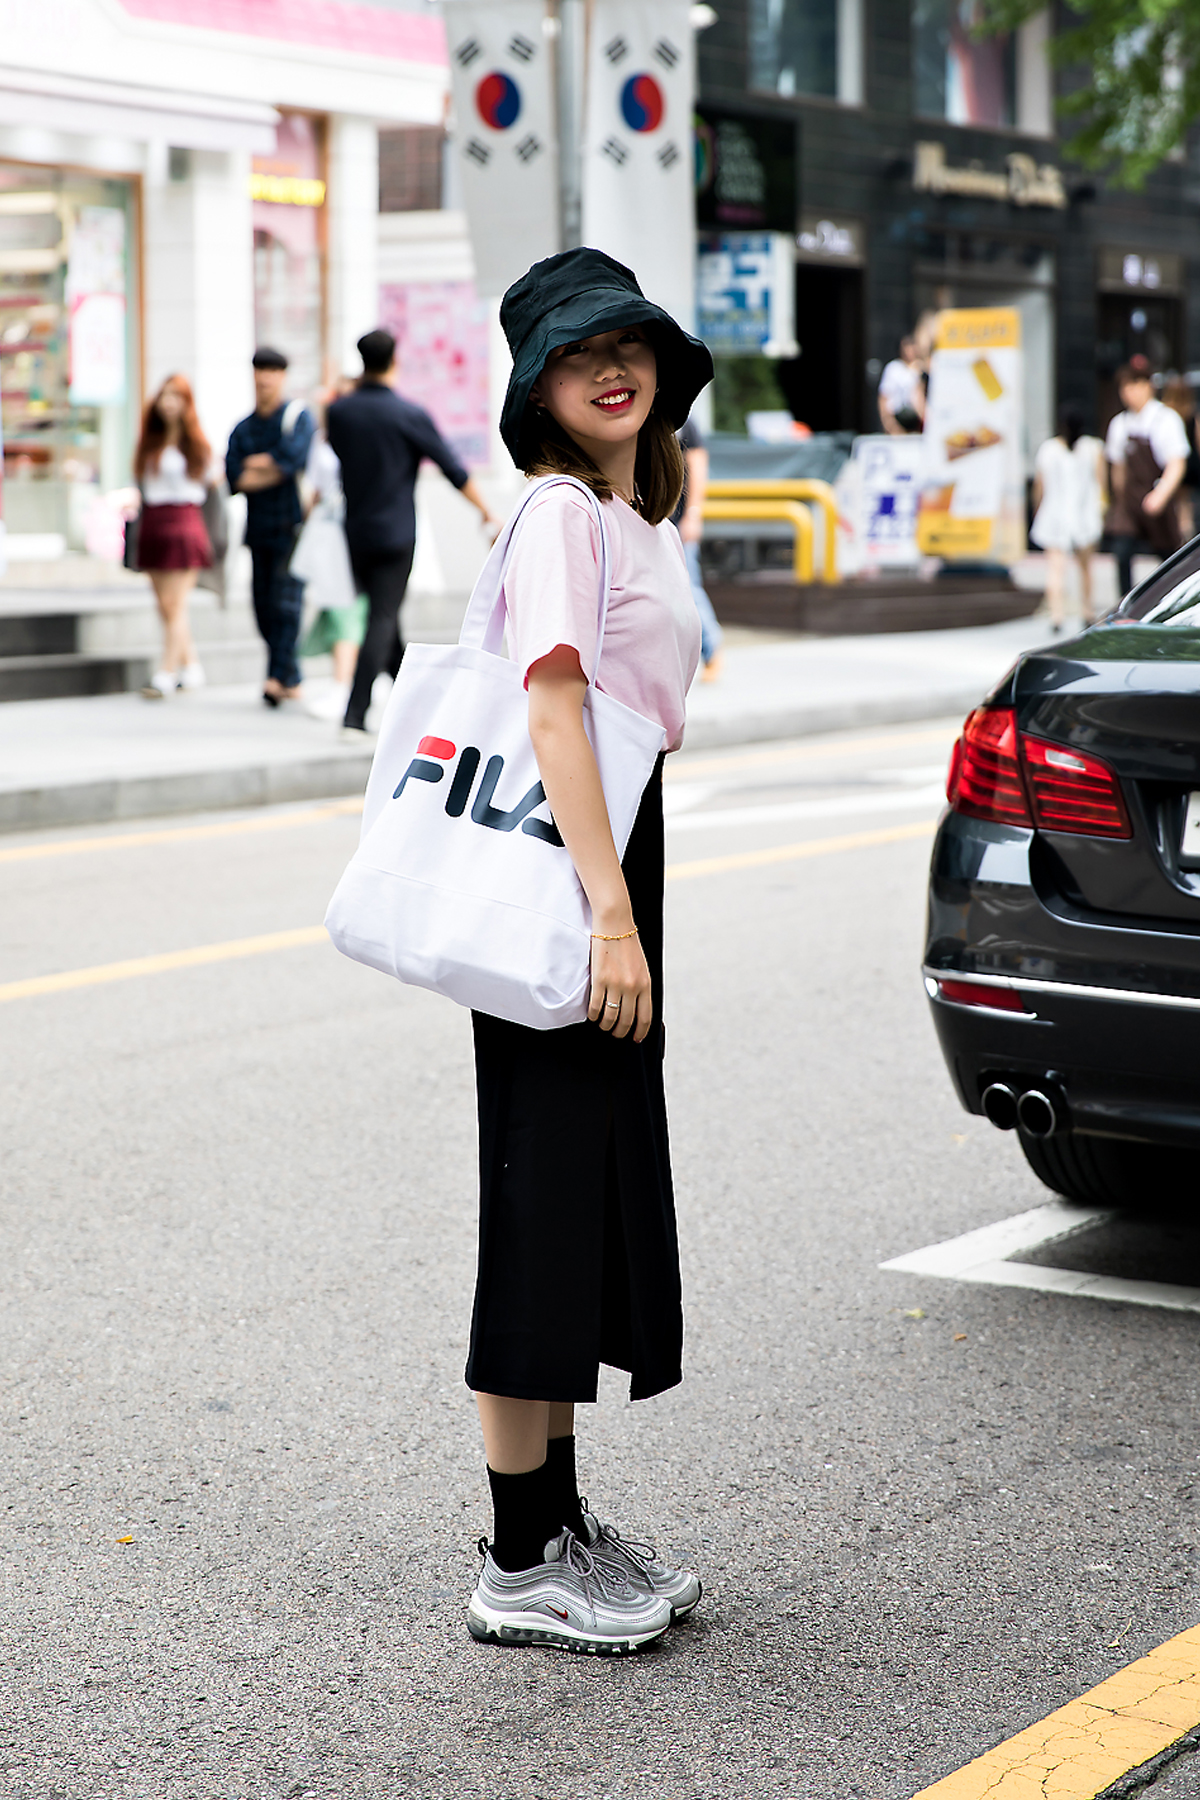 SUNZHOUYA, Street Fashion 2017 in Seoul.jpg